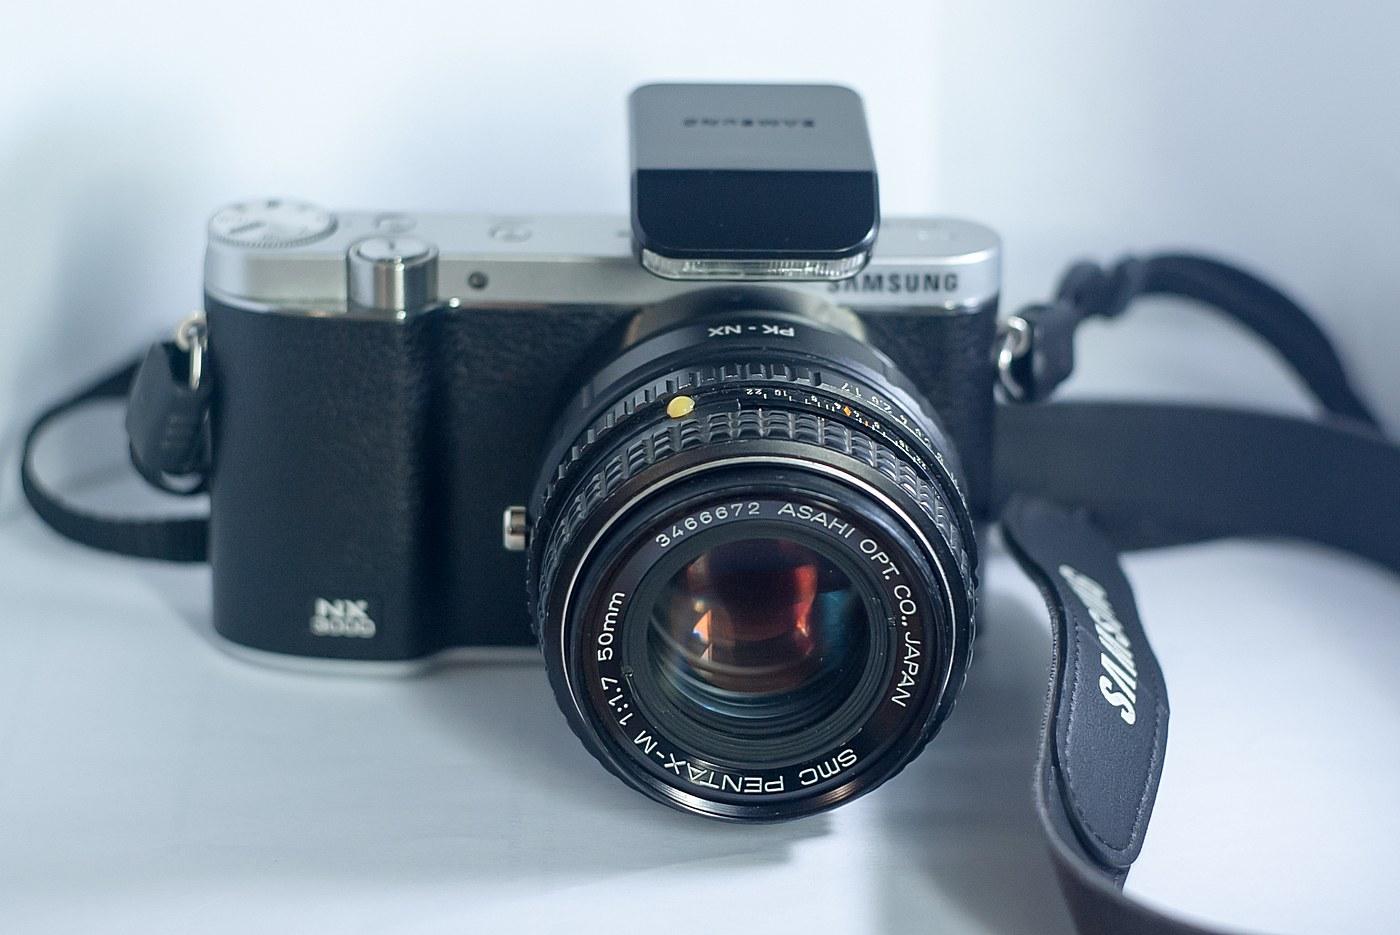 Samsung NX3000 + Pentax M 50mm 1.7